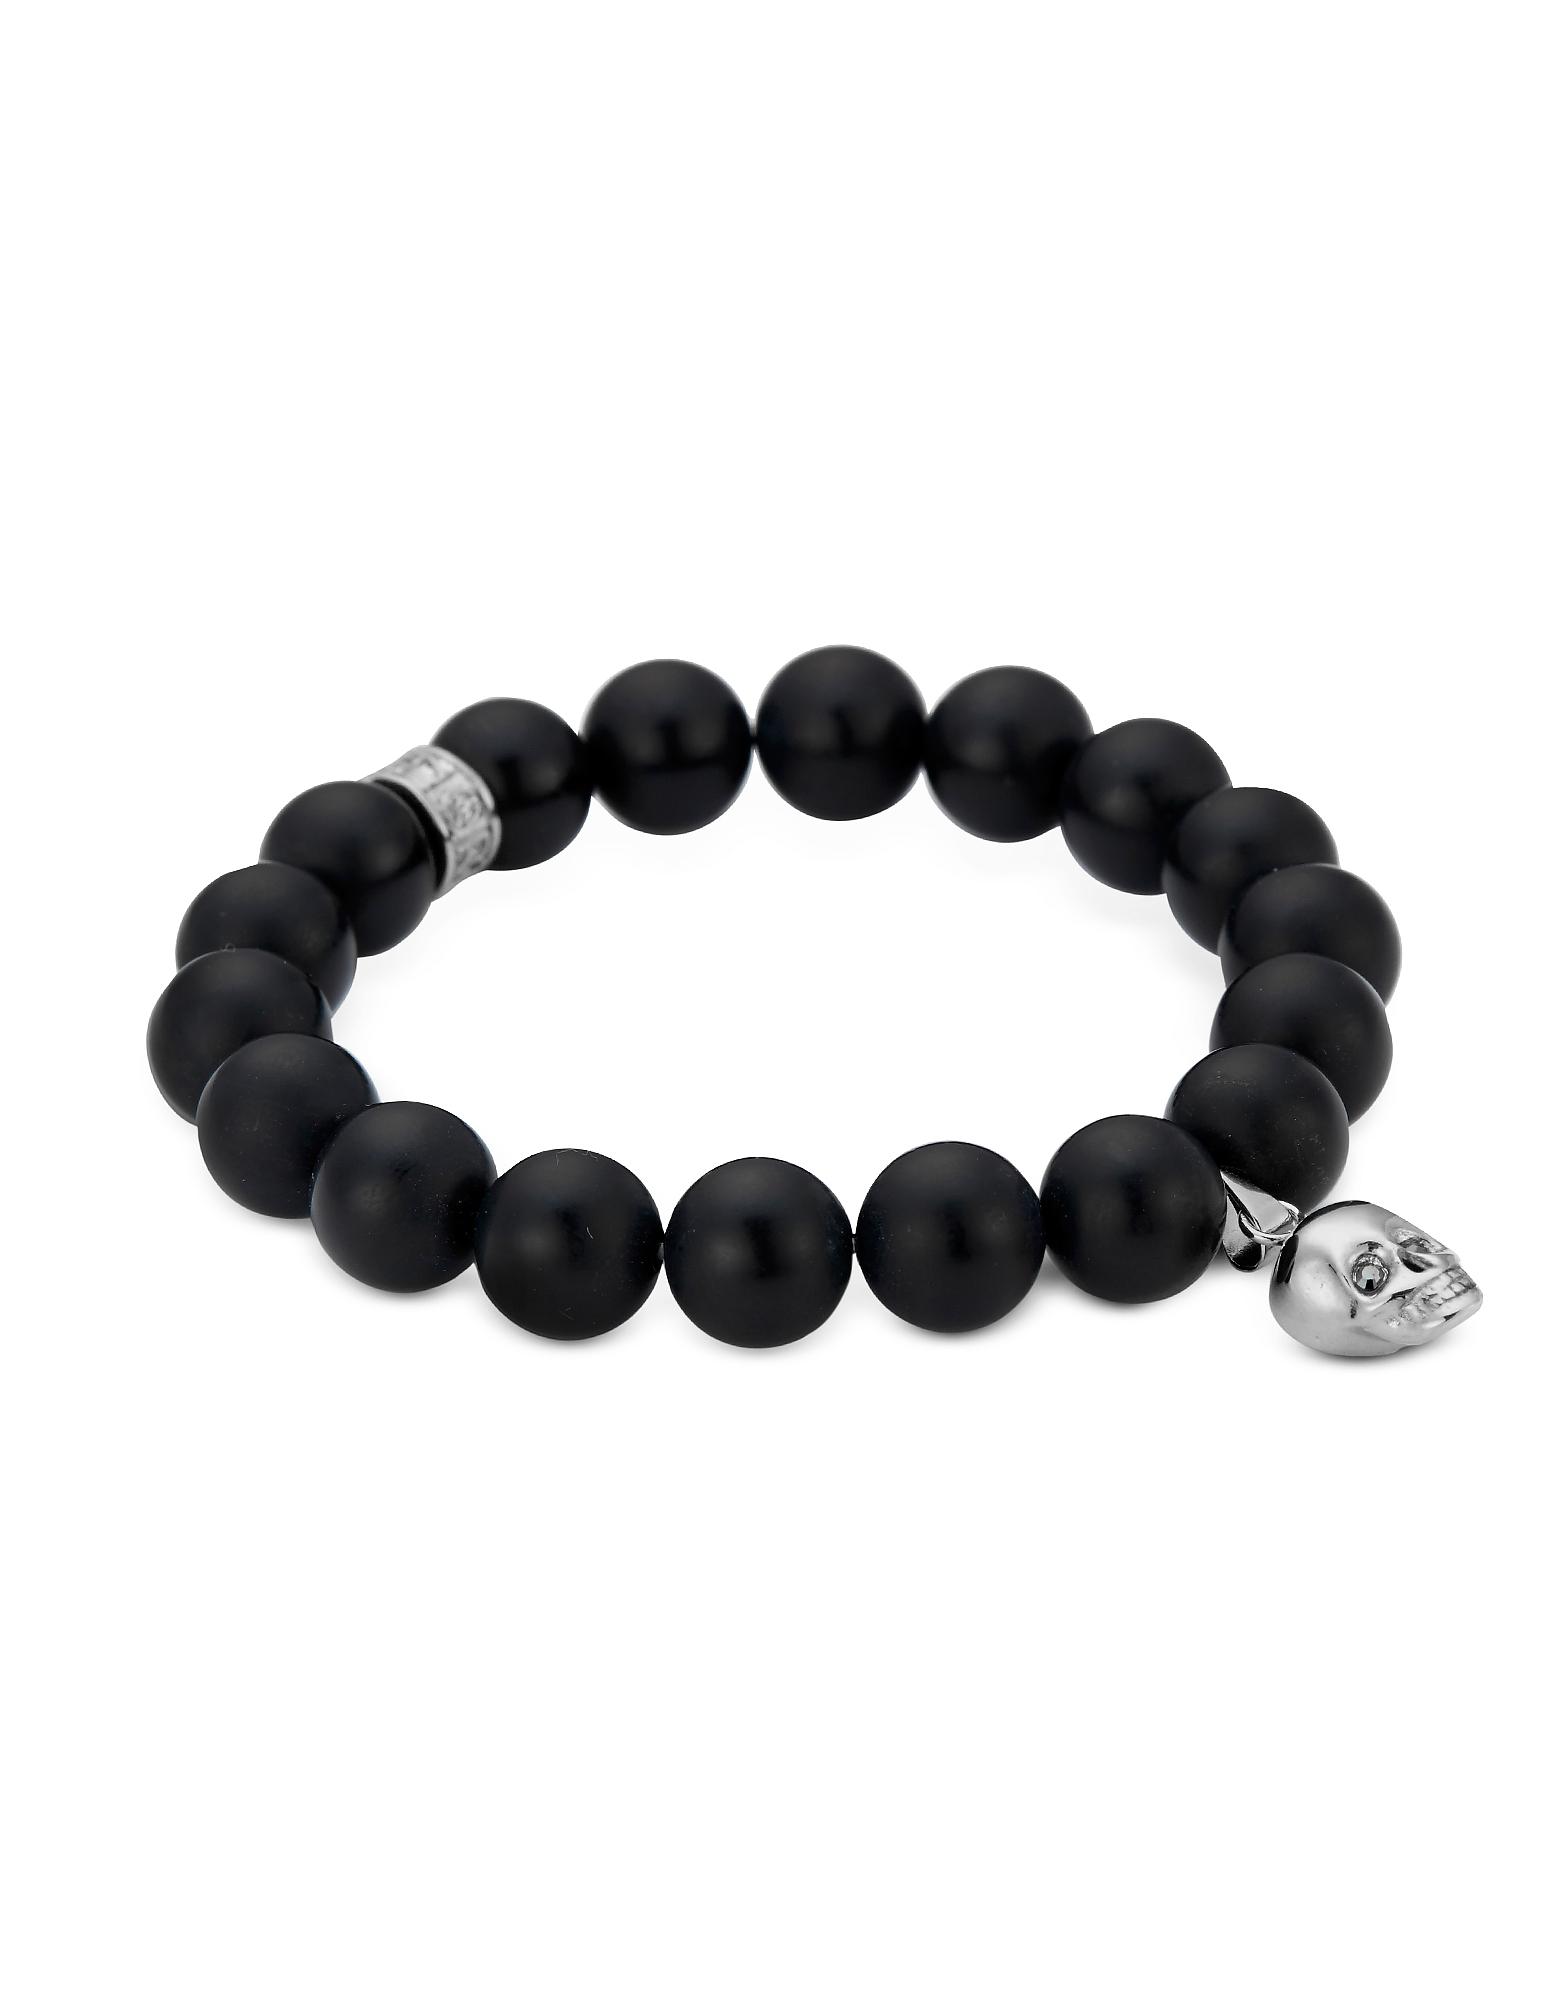 Northskull Men's Bracelets, Matte Black Onyx/Silver Skull Bracelet with Black Crystal